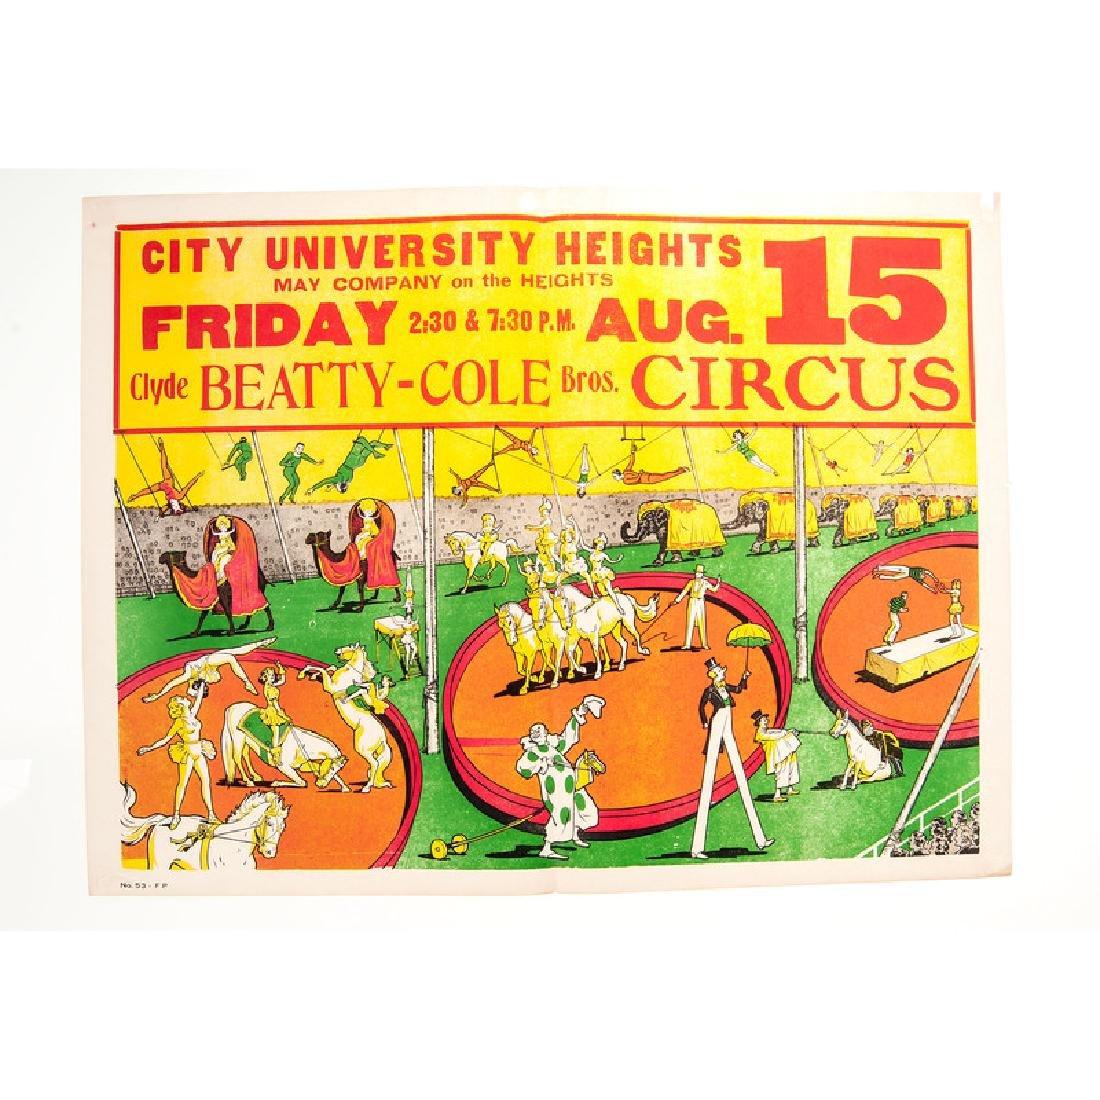 American Circus Posters - 7